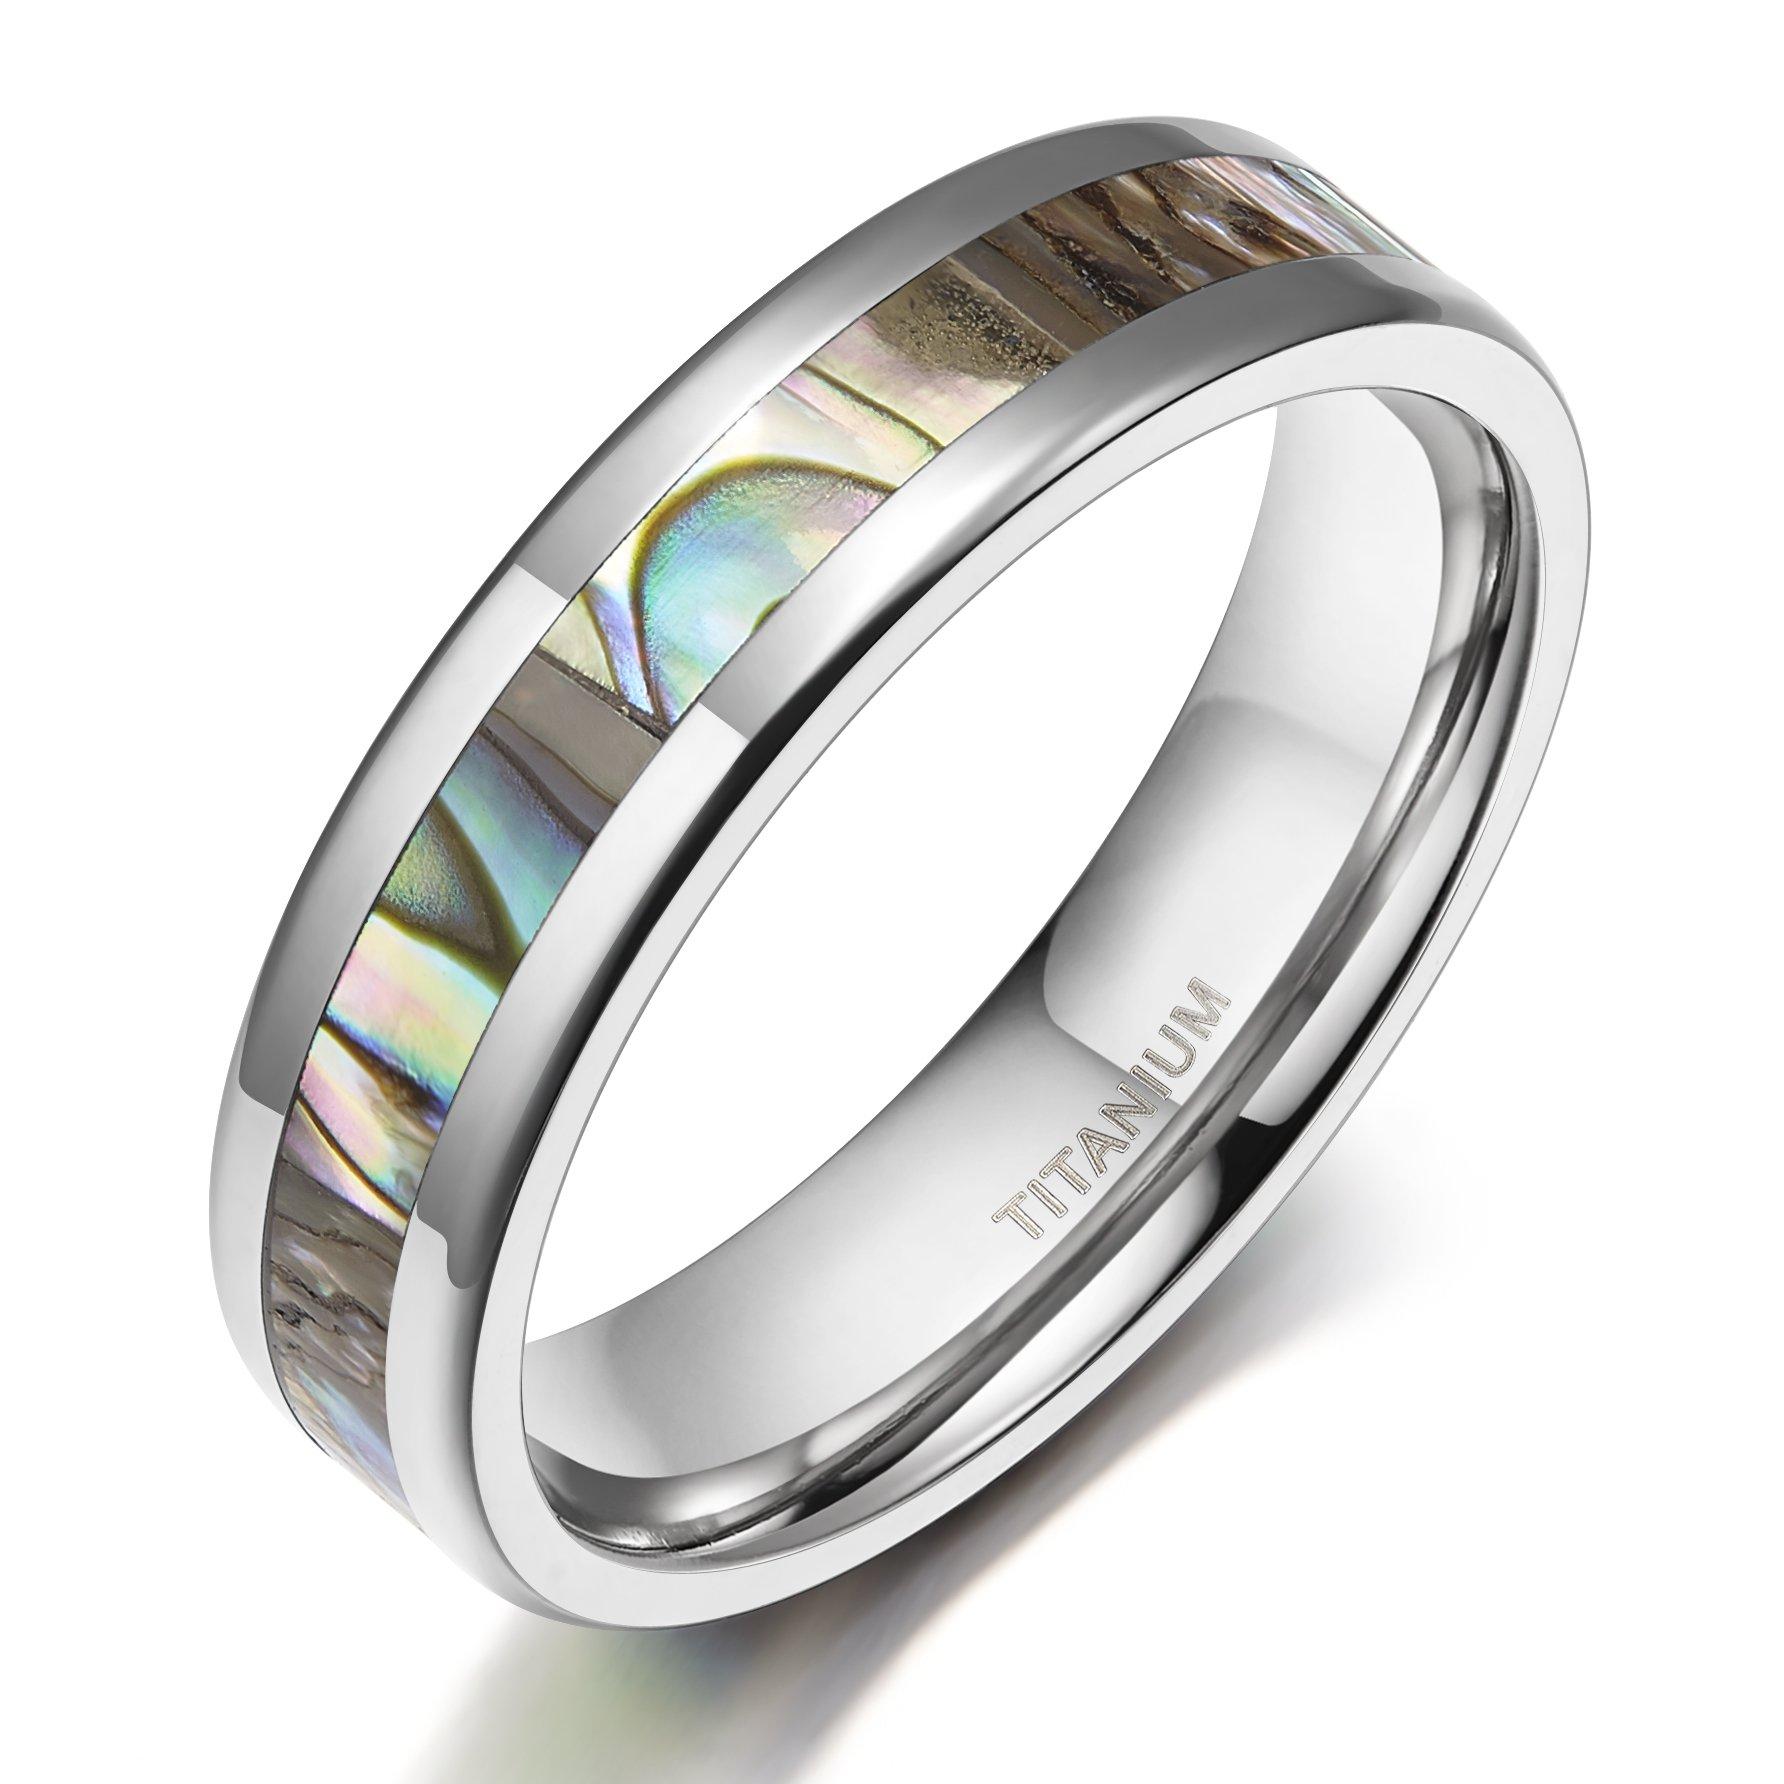 TIGRADE Mens Womens Titanium Ring Abalone Shell Inlay Wedding Bands Comfort Fit Beveled Edge